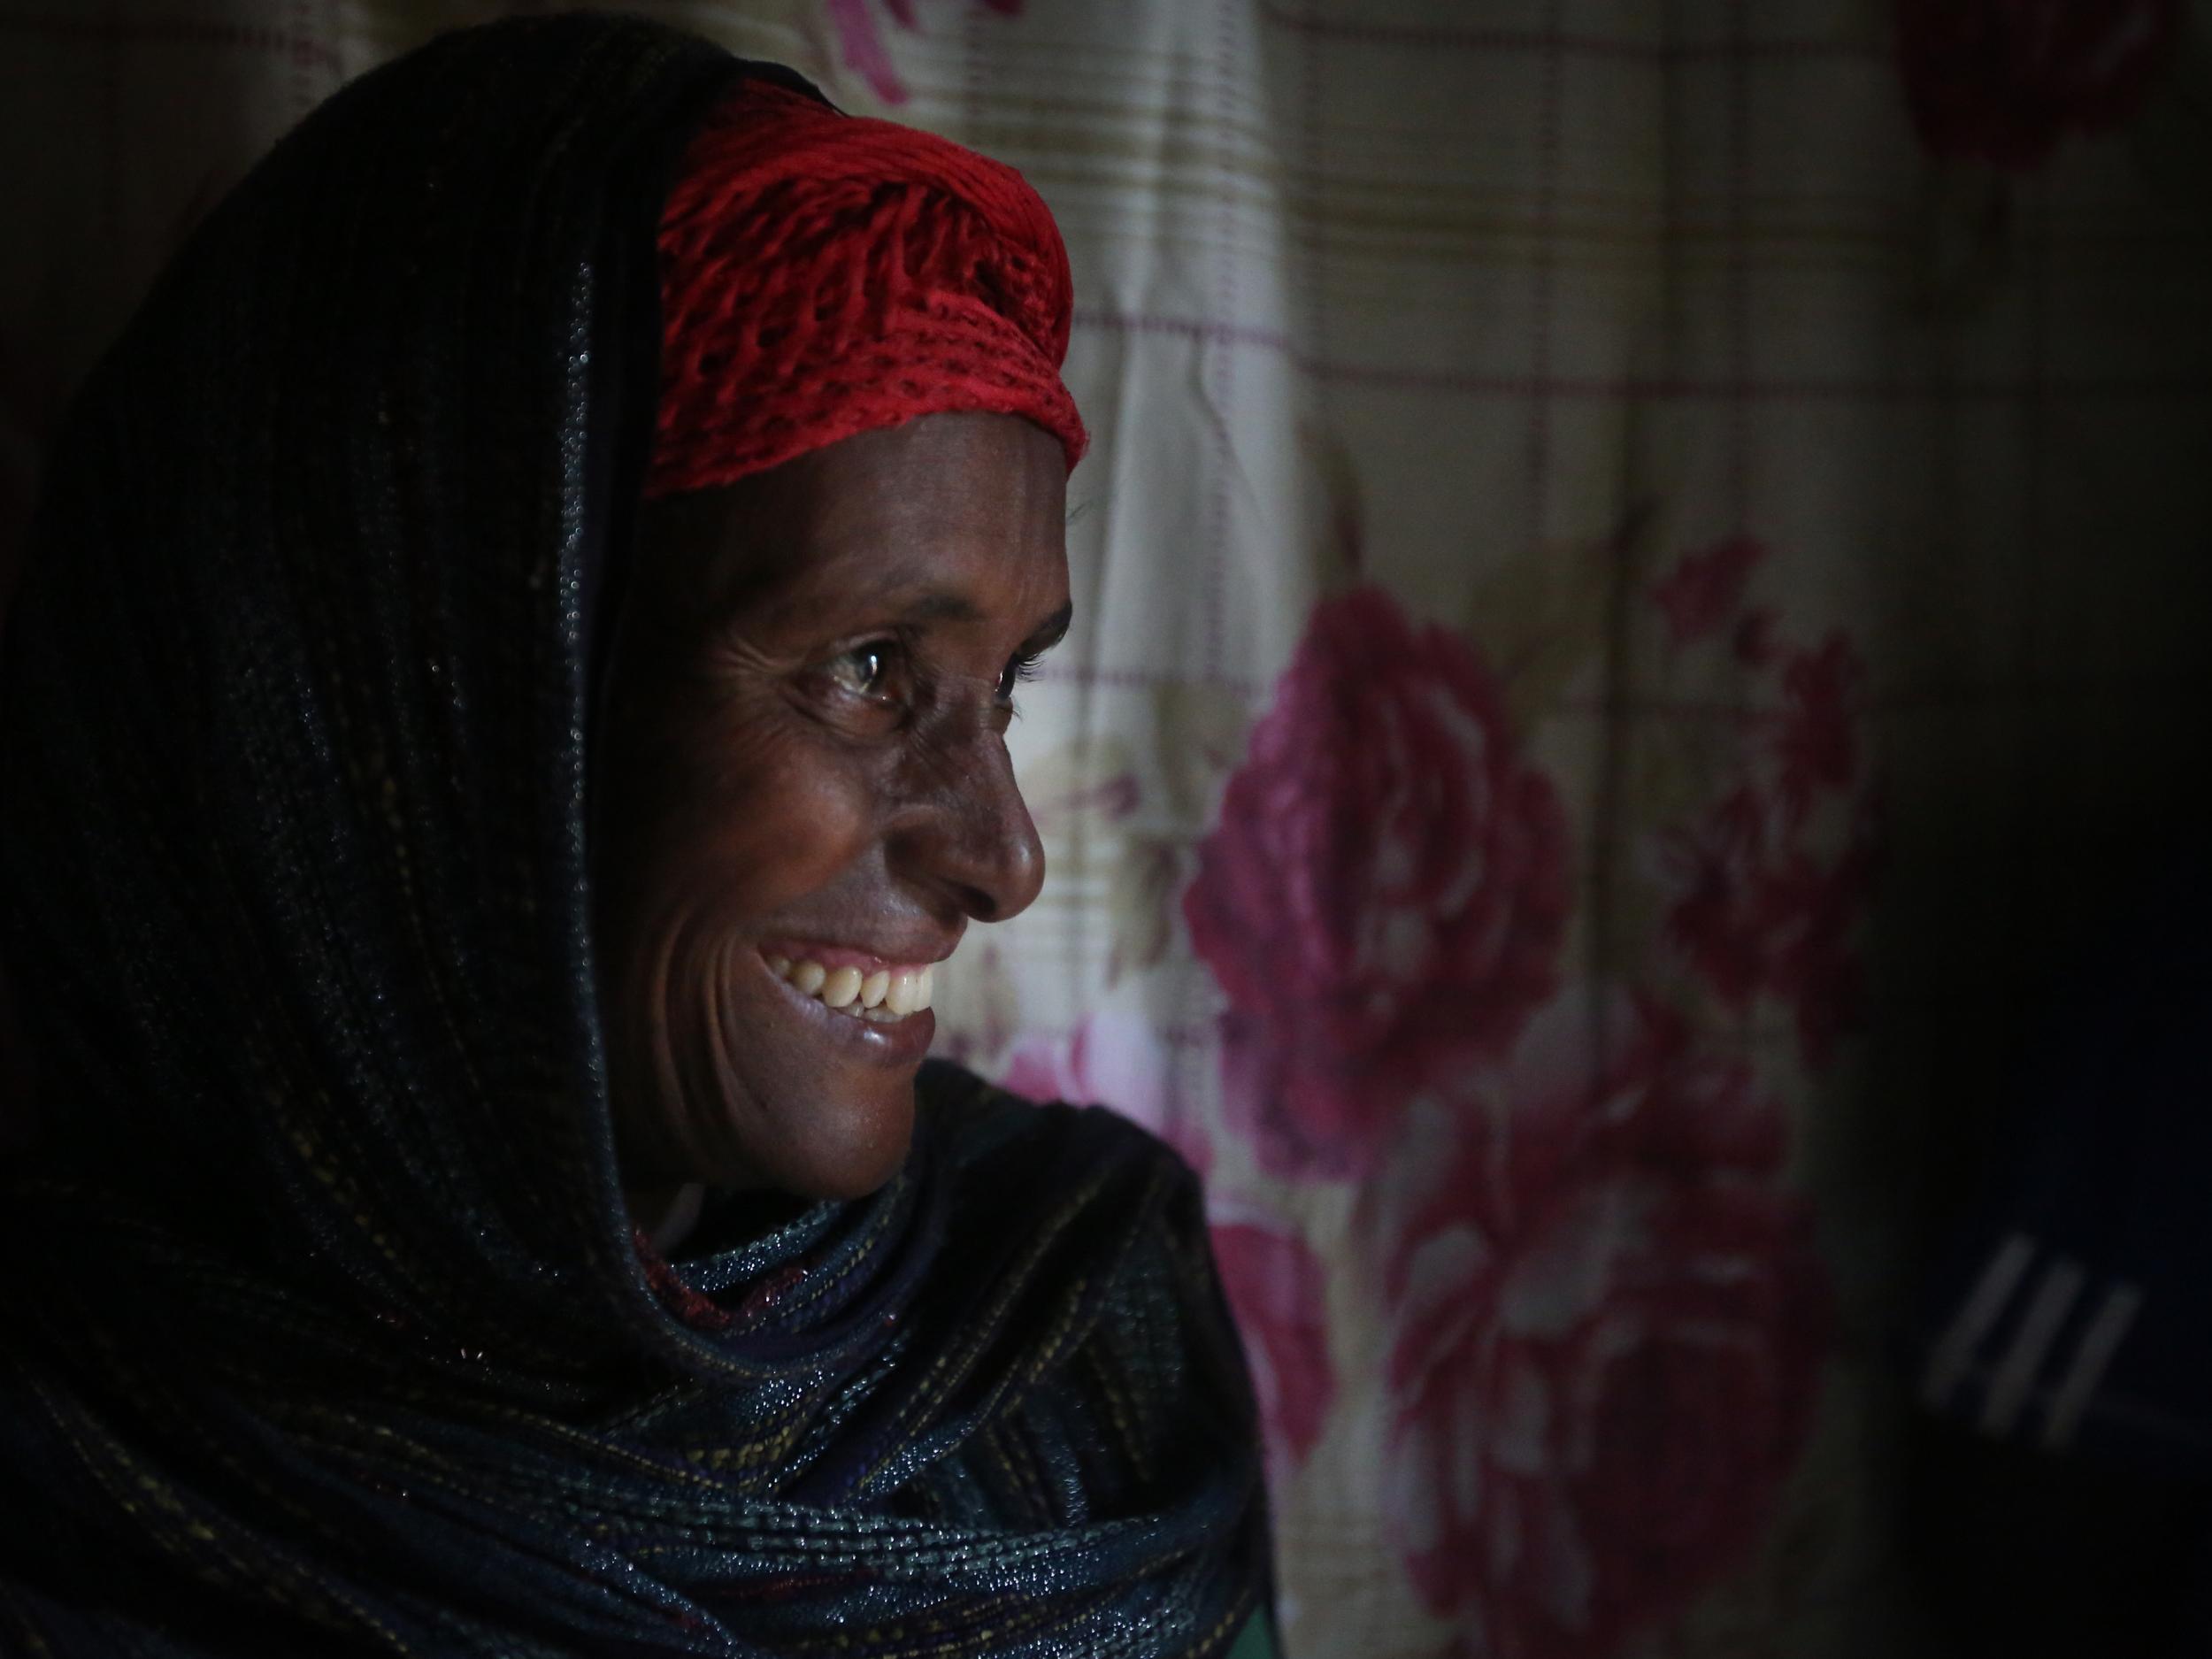 uk_Ethiopia_day5_3128_bdm.jpg